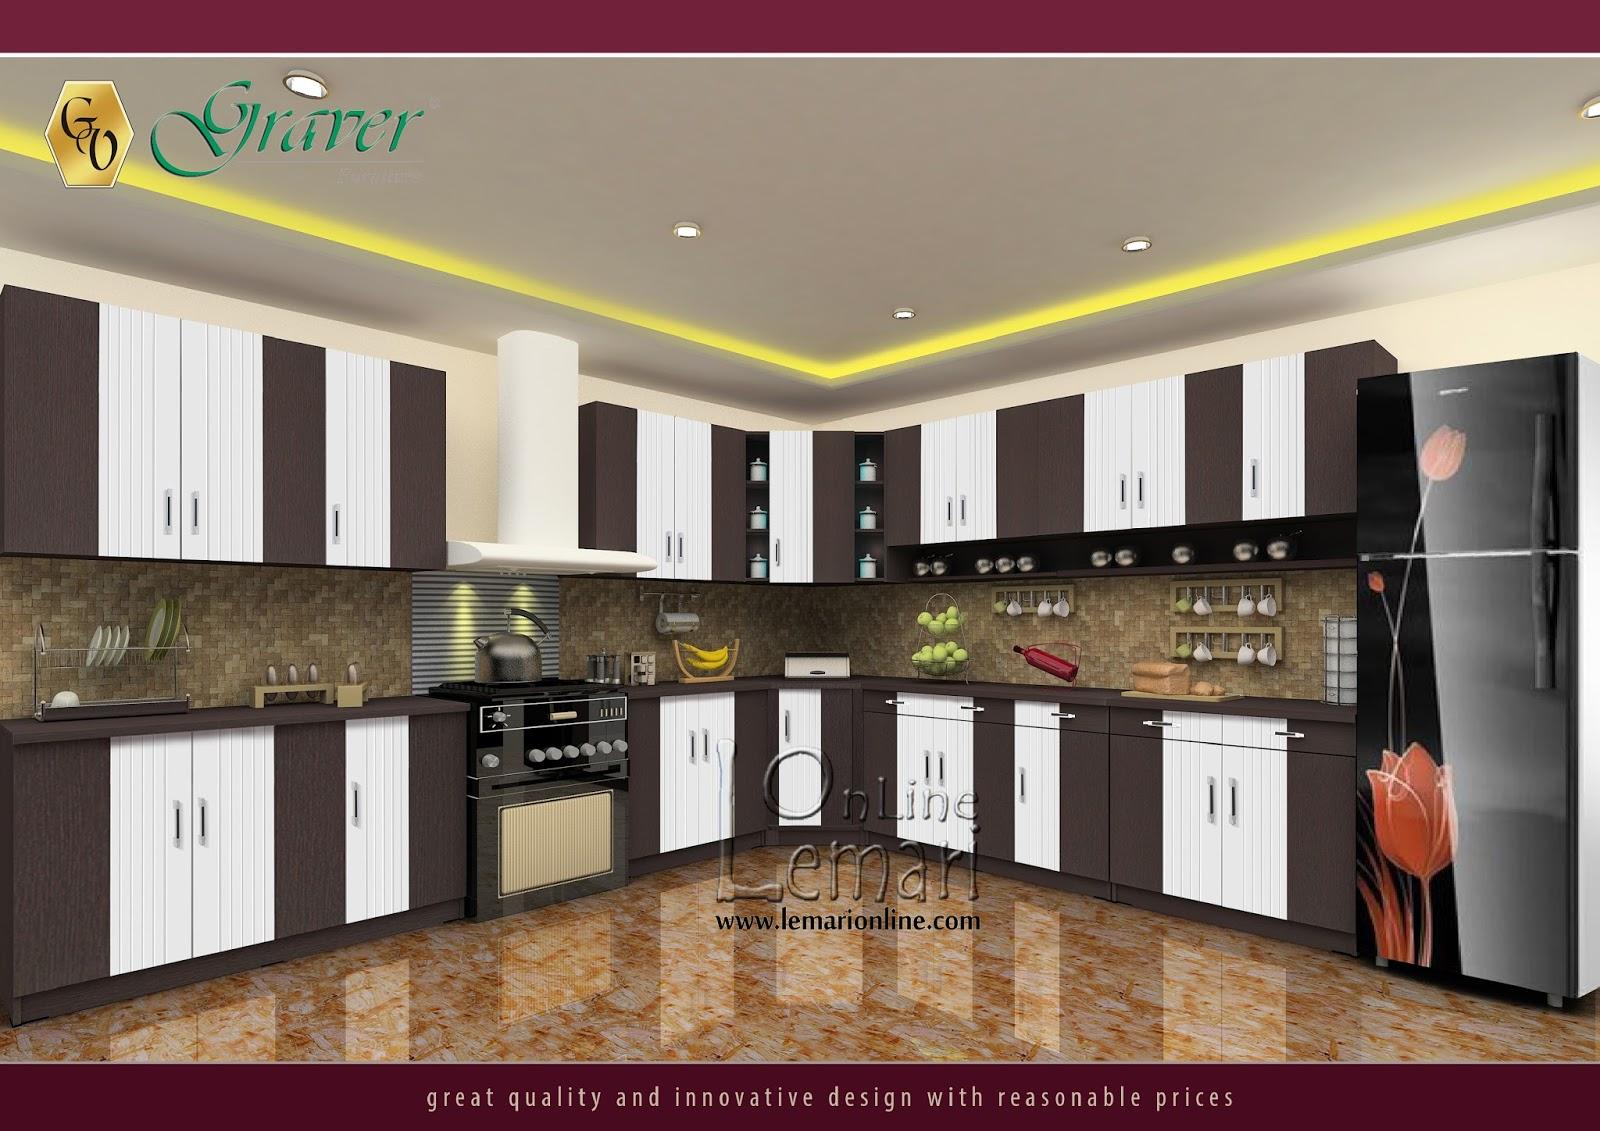 Minimalis, elegan, modernis adalah bentuk ungkapan estetika sudut dapur Anata